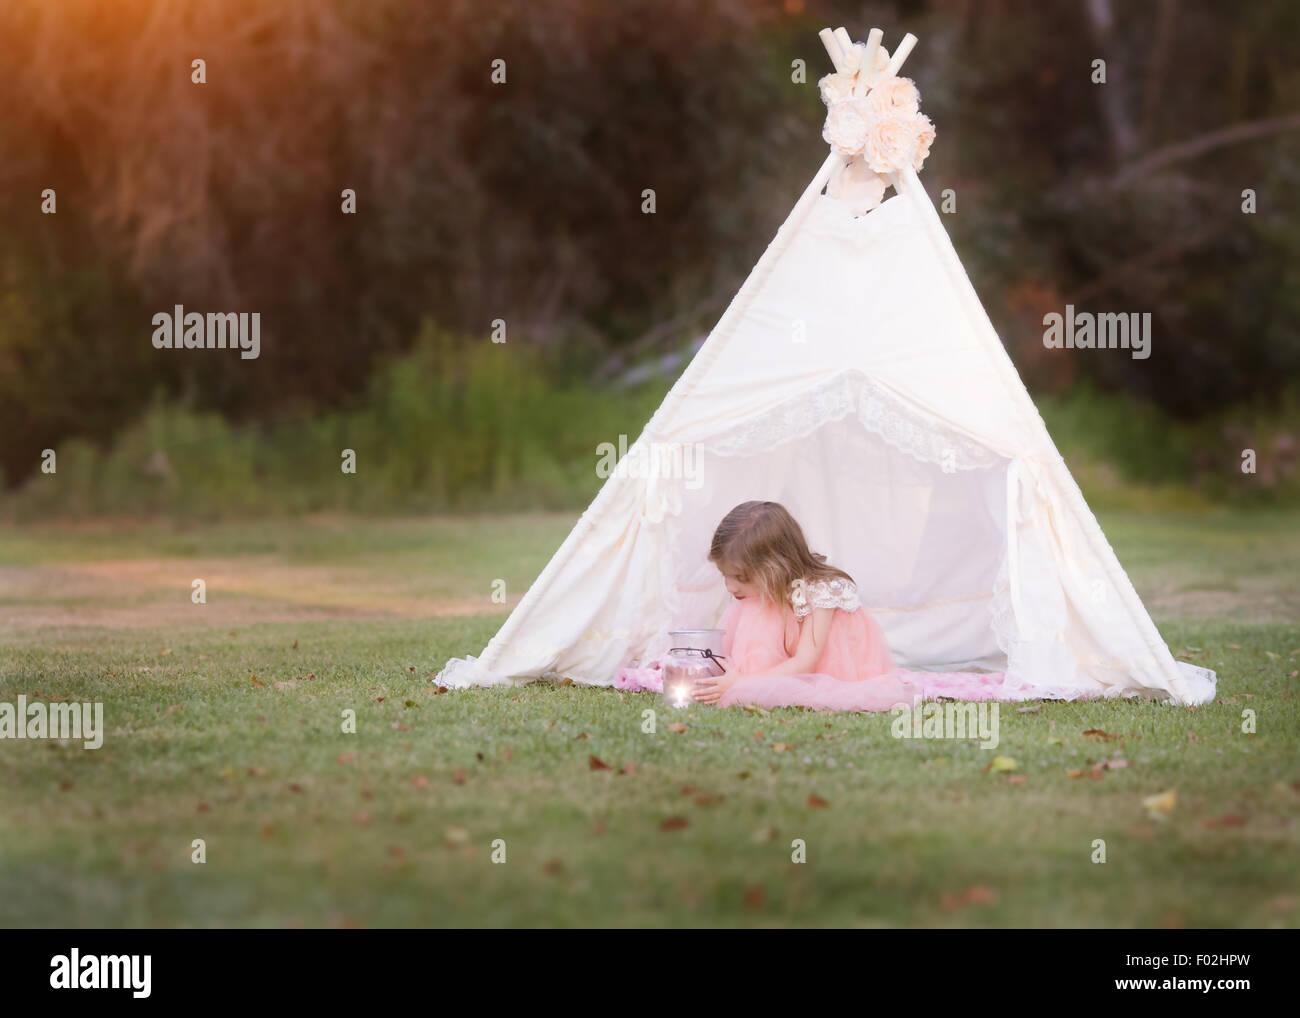 Girl sitting in a wigwam gazing into a lantern jar - Stock Image